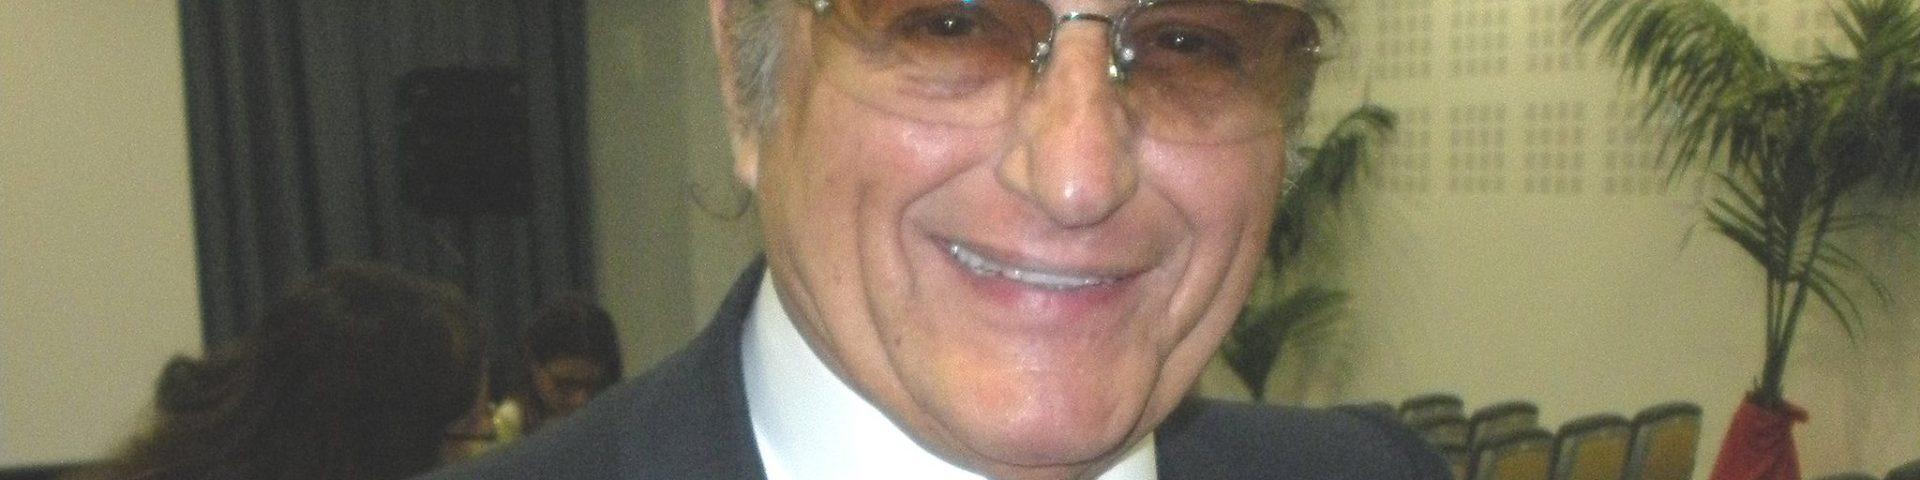 Tony Renis tra scandali e grandi successi: biografia e curiosità